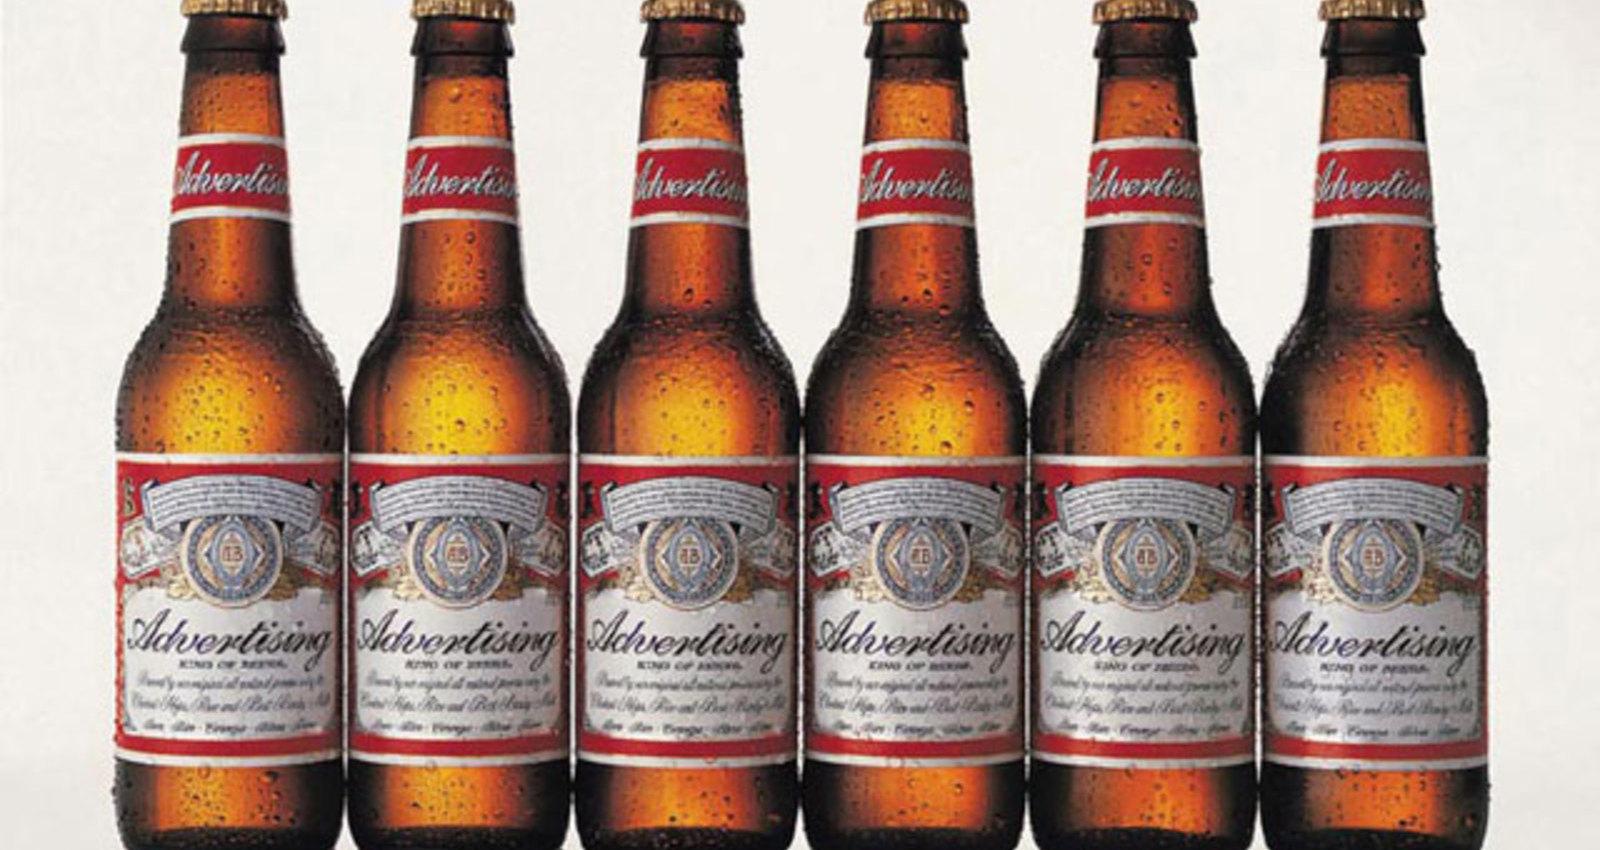 Coke, Altoids, Budweiser